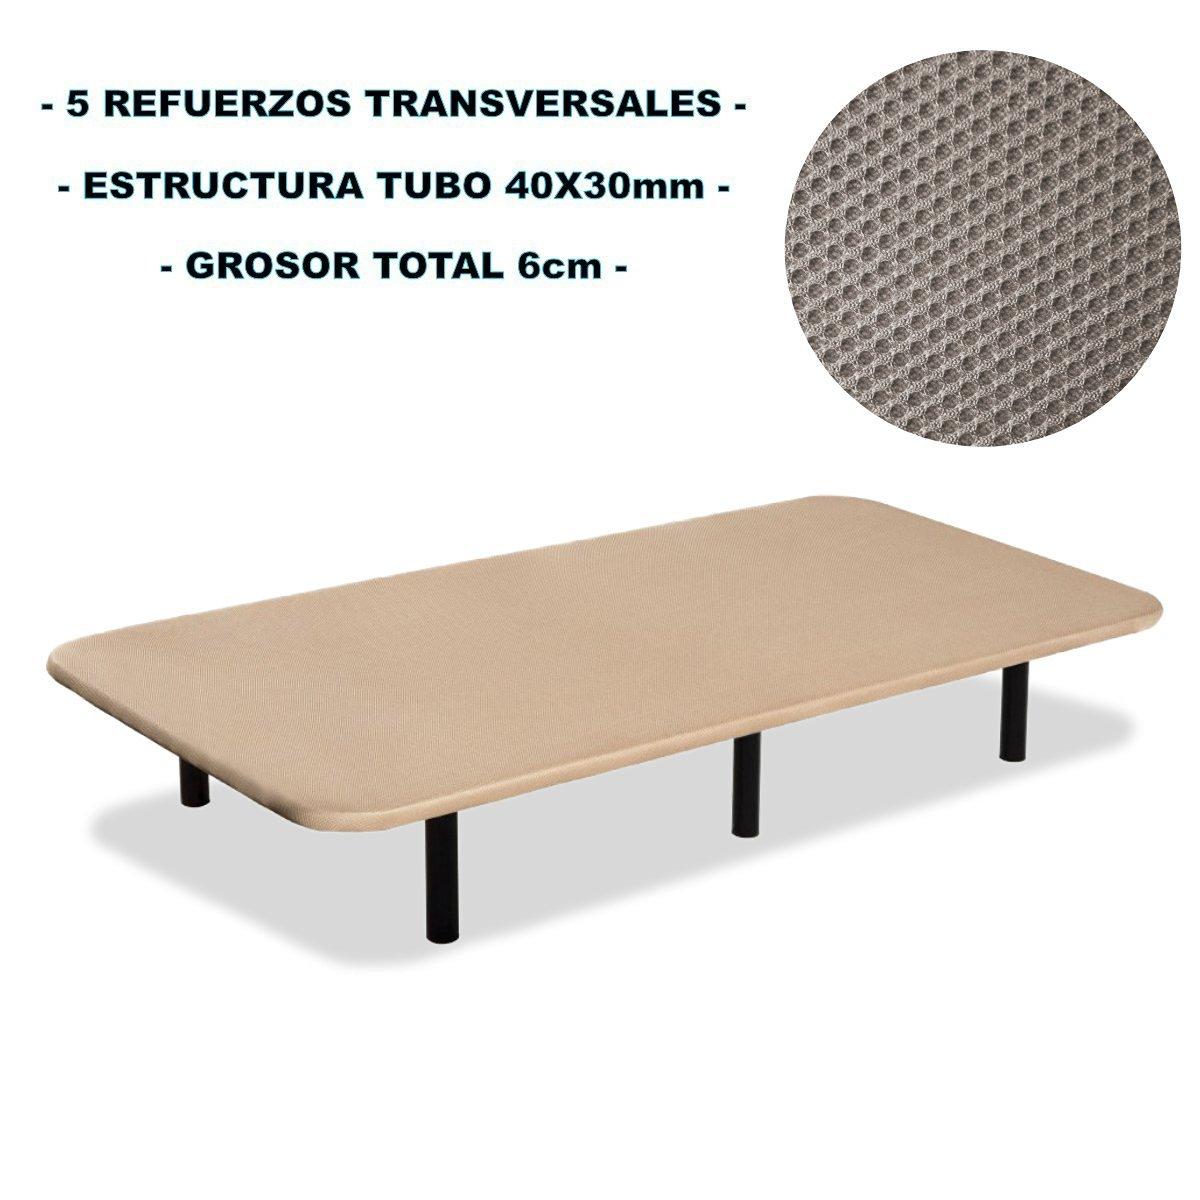 Bonitex - Base tapizada 3D 135x190cm + 6 patas, 5 refuerzos transversales, grosor 6cm